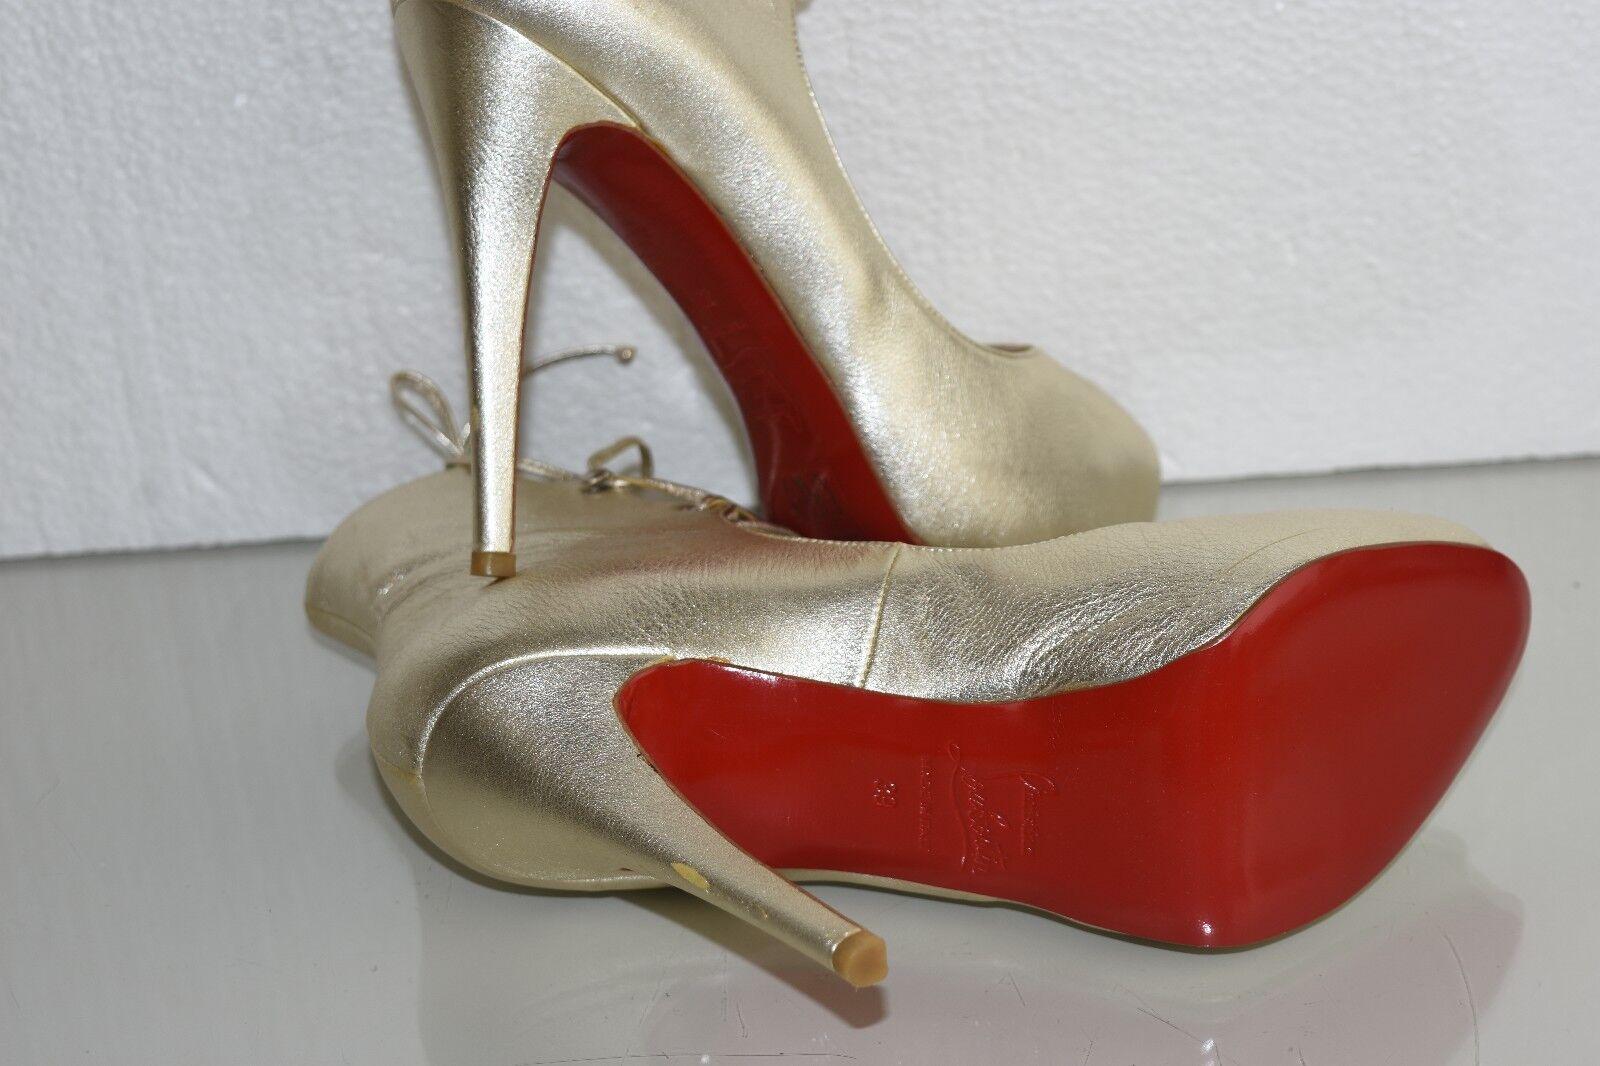 Neu Neu Neu Christian Louboutin Juste 120 Leder Stiefel Hells Sahara Goldschuhe 39 0e66bc